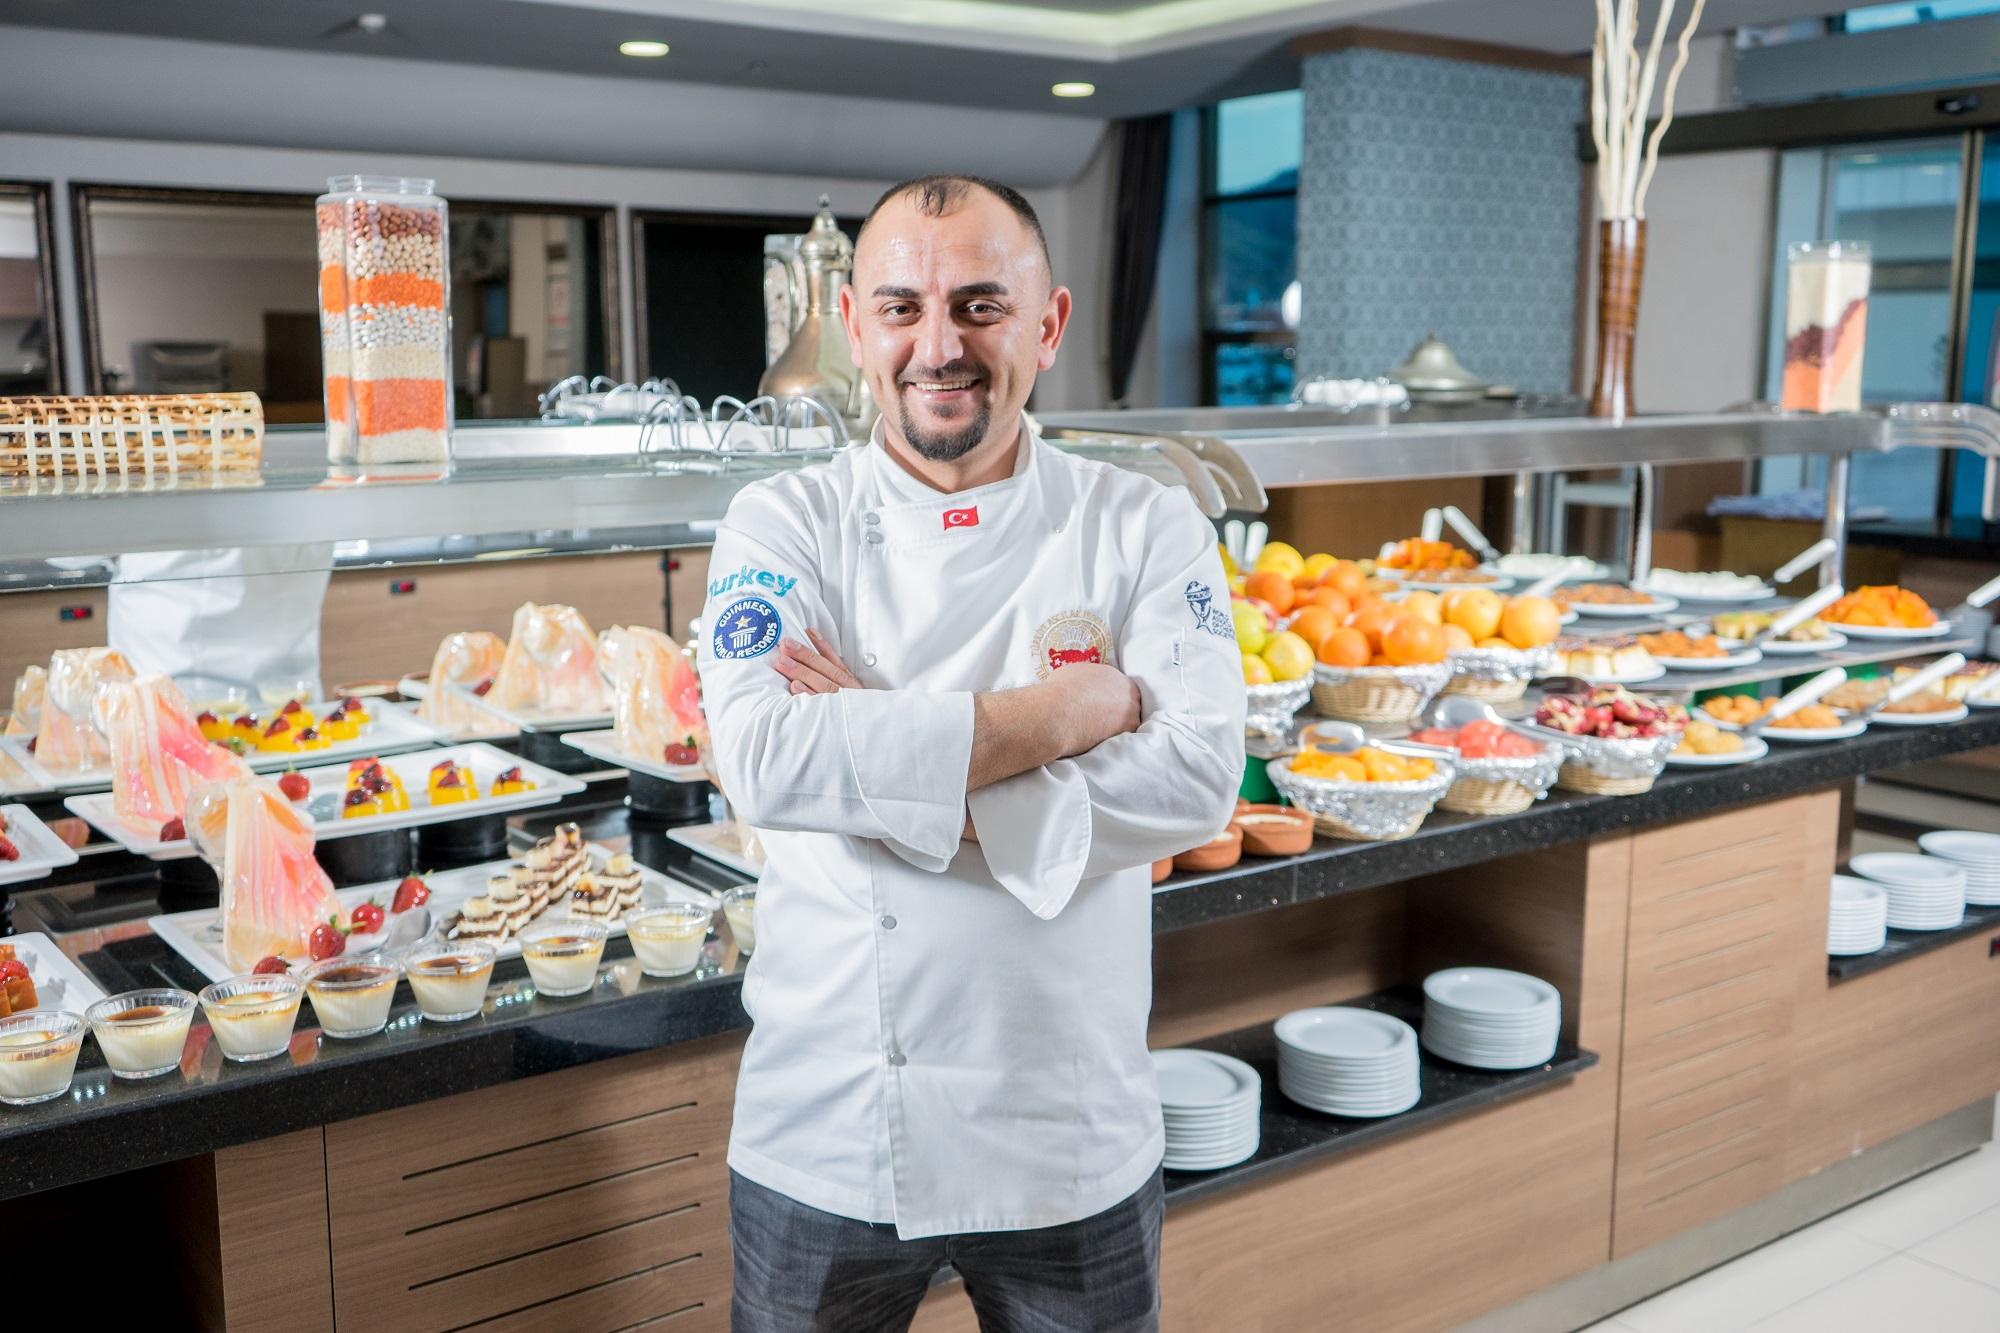 Afyon'un gastronomi şehri olduğu kanıtlanacak